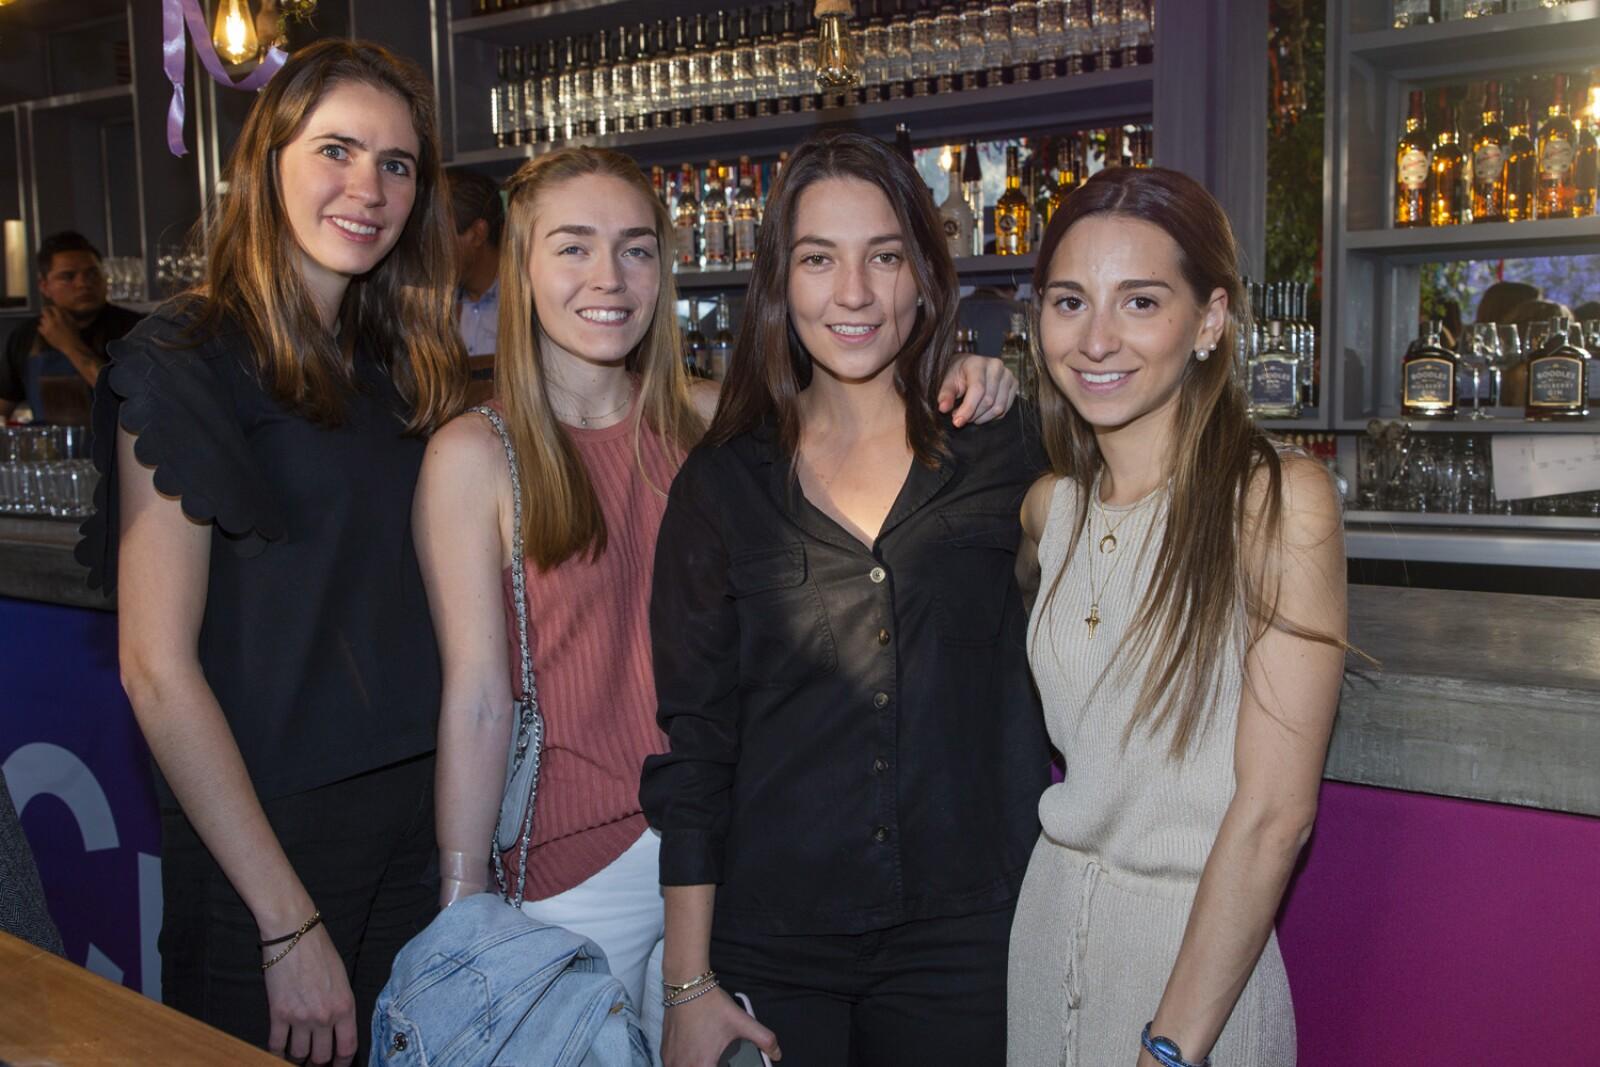 Paula Perlon, Maria Artigas, Fernanda Padilla, Victoria Alcocer